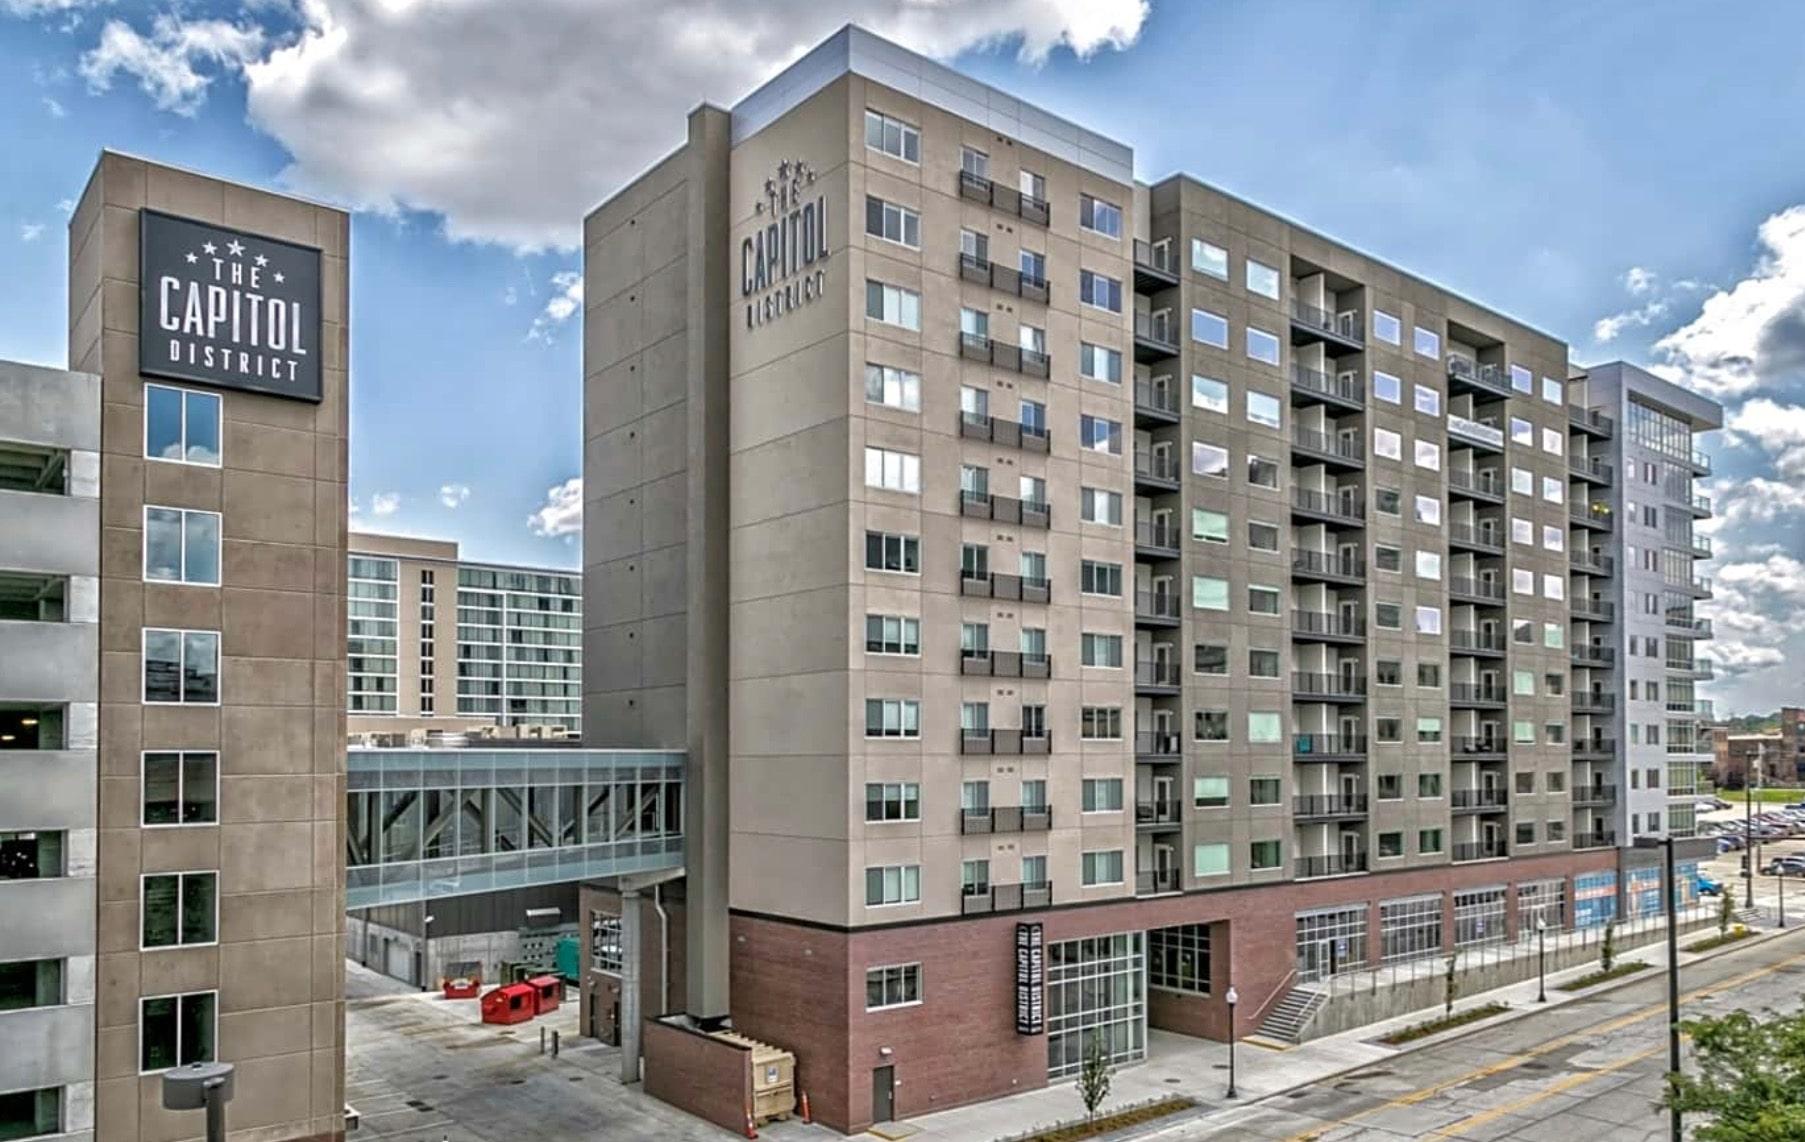 Capitol District Apartments Omaha